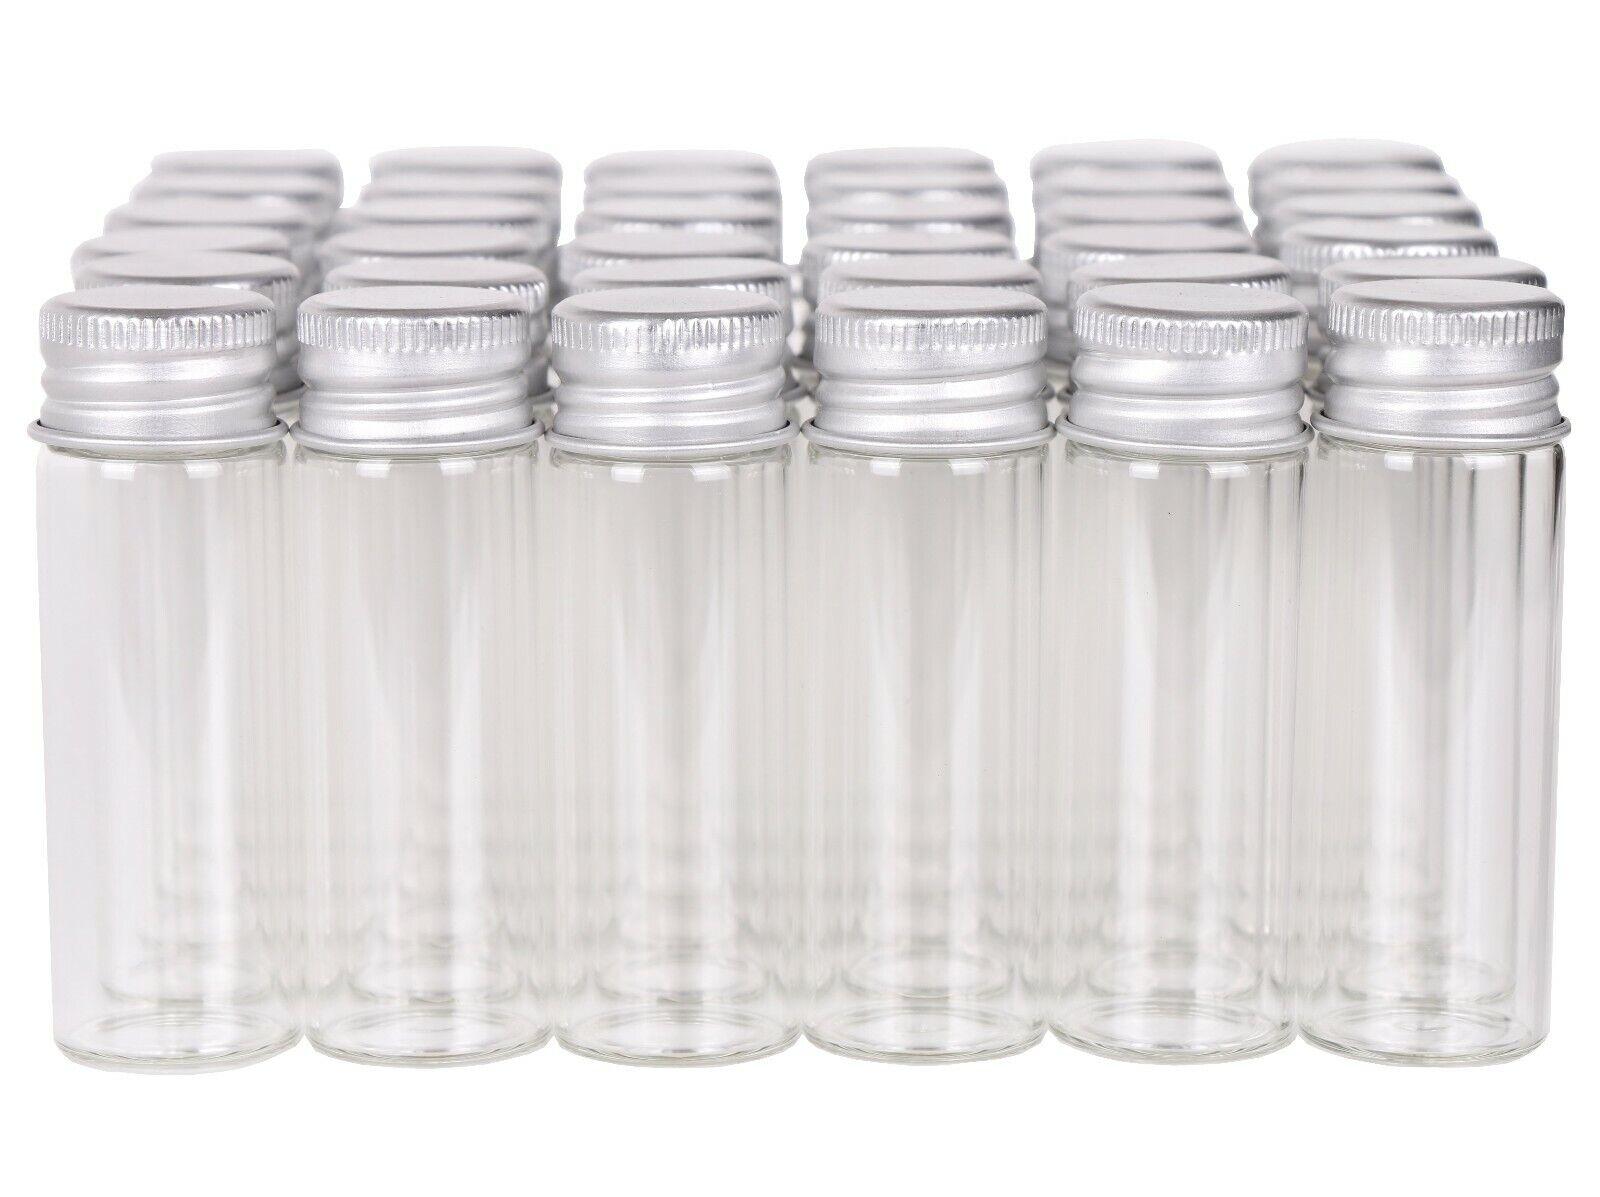 100X 15ml Small Glass Bottles Tiny Vials Mini Jars with Alum